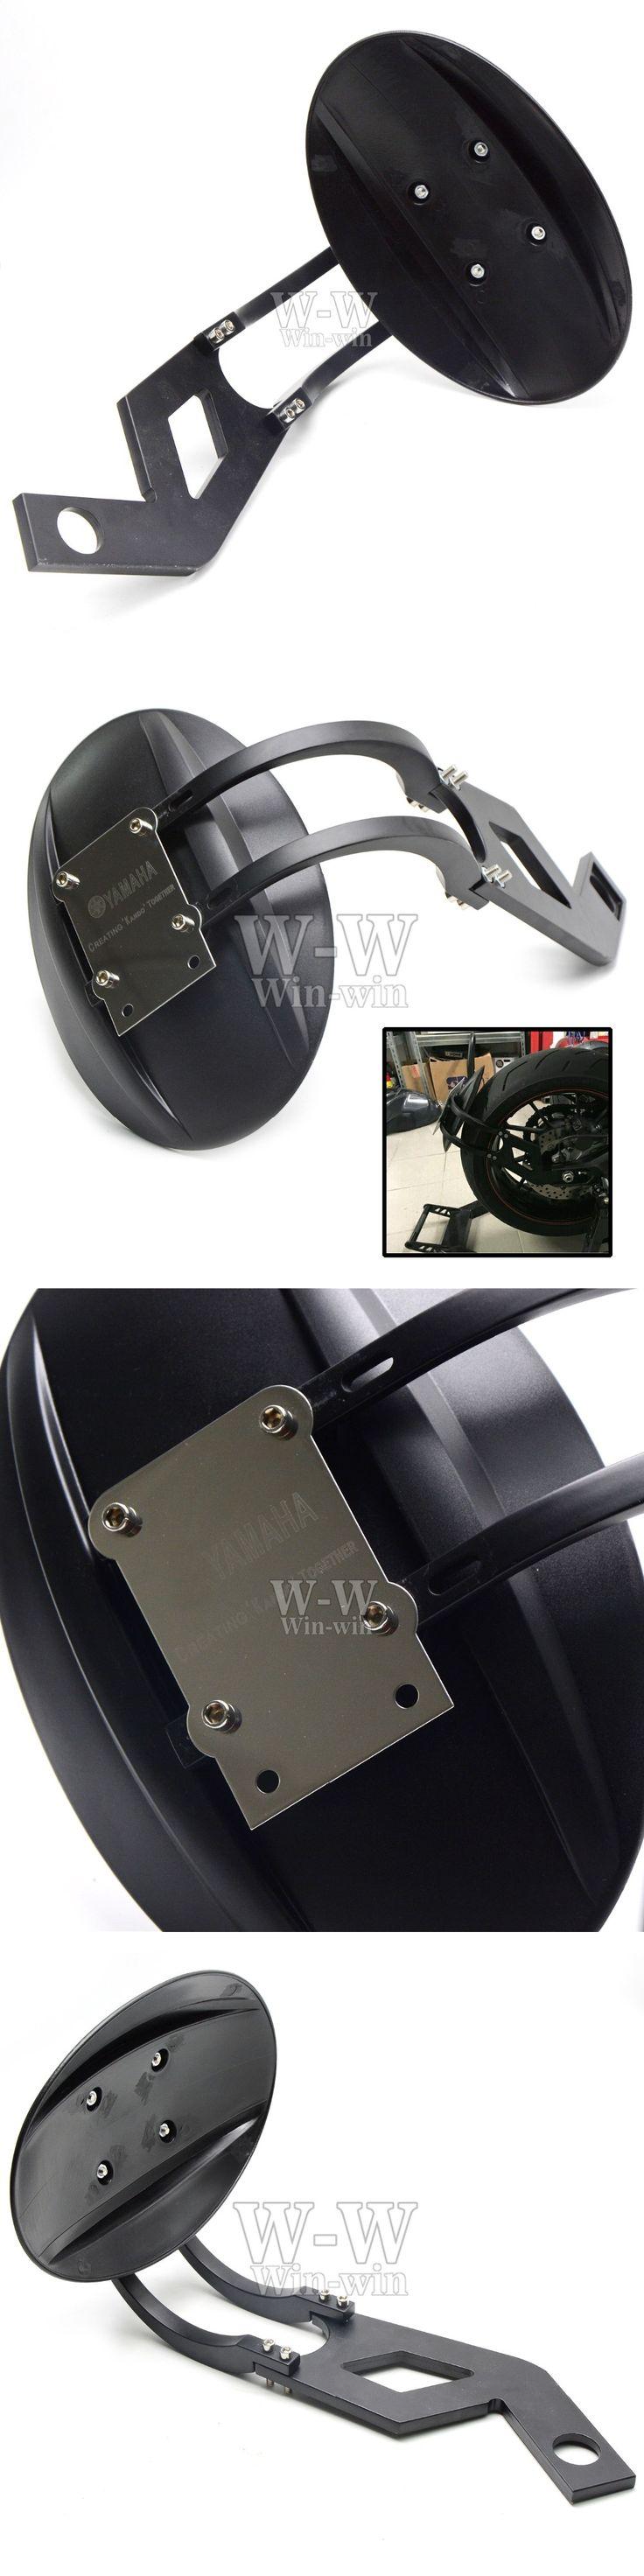 Motorcycle cnc mudguard fender motorbike rear fender for yamaha MT-09 mt 09 mt09 FZ-09 FJ-09 MT FZ FJ 09 2013 2014 2015 2016